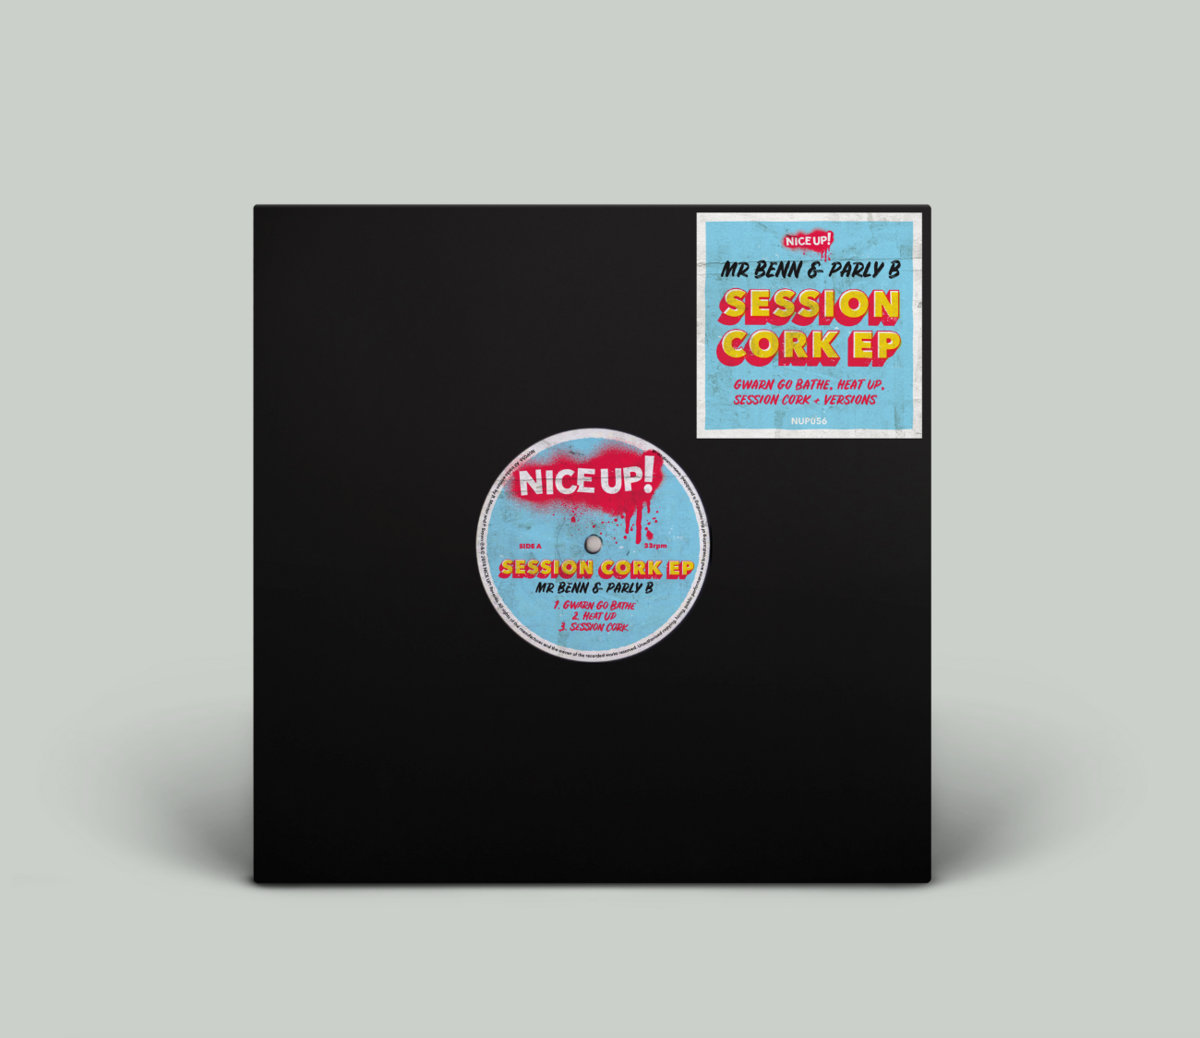 Session Cork EP | Mr Benn